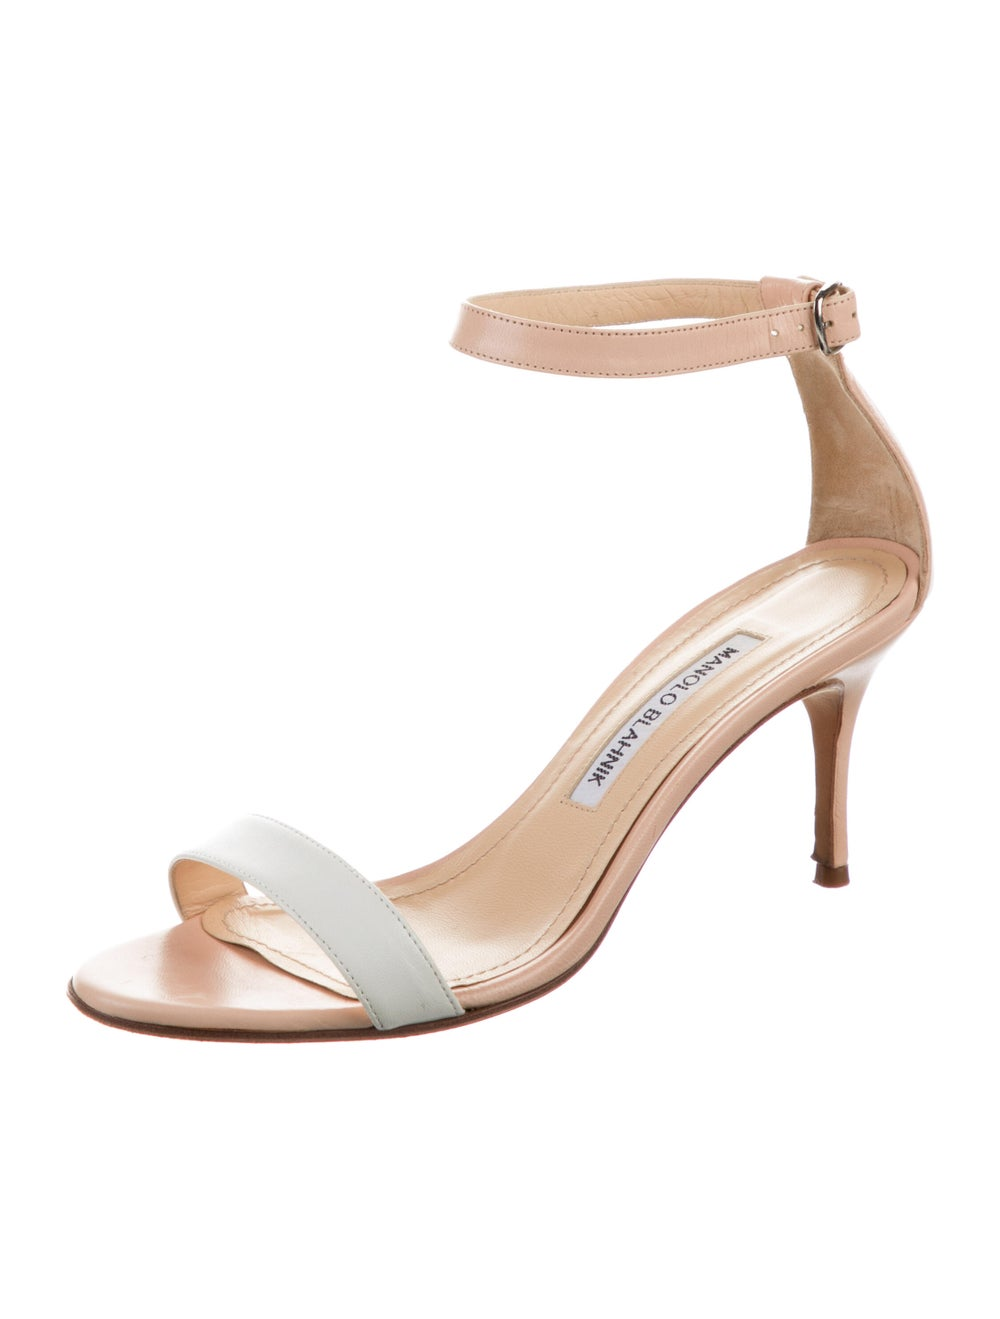 Manolo Blahnik Leather Sandals - image 2